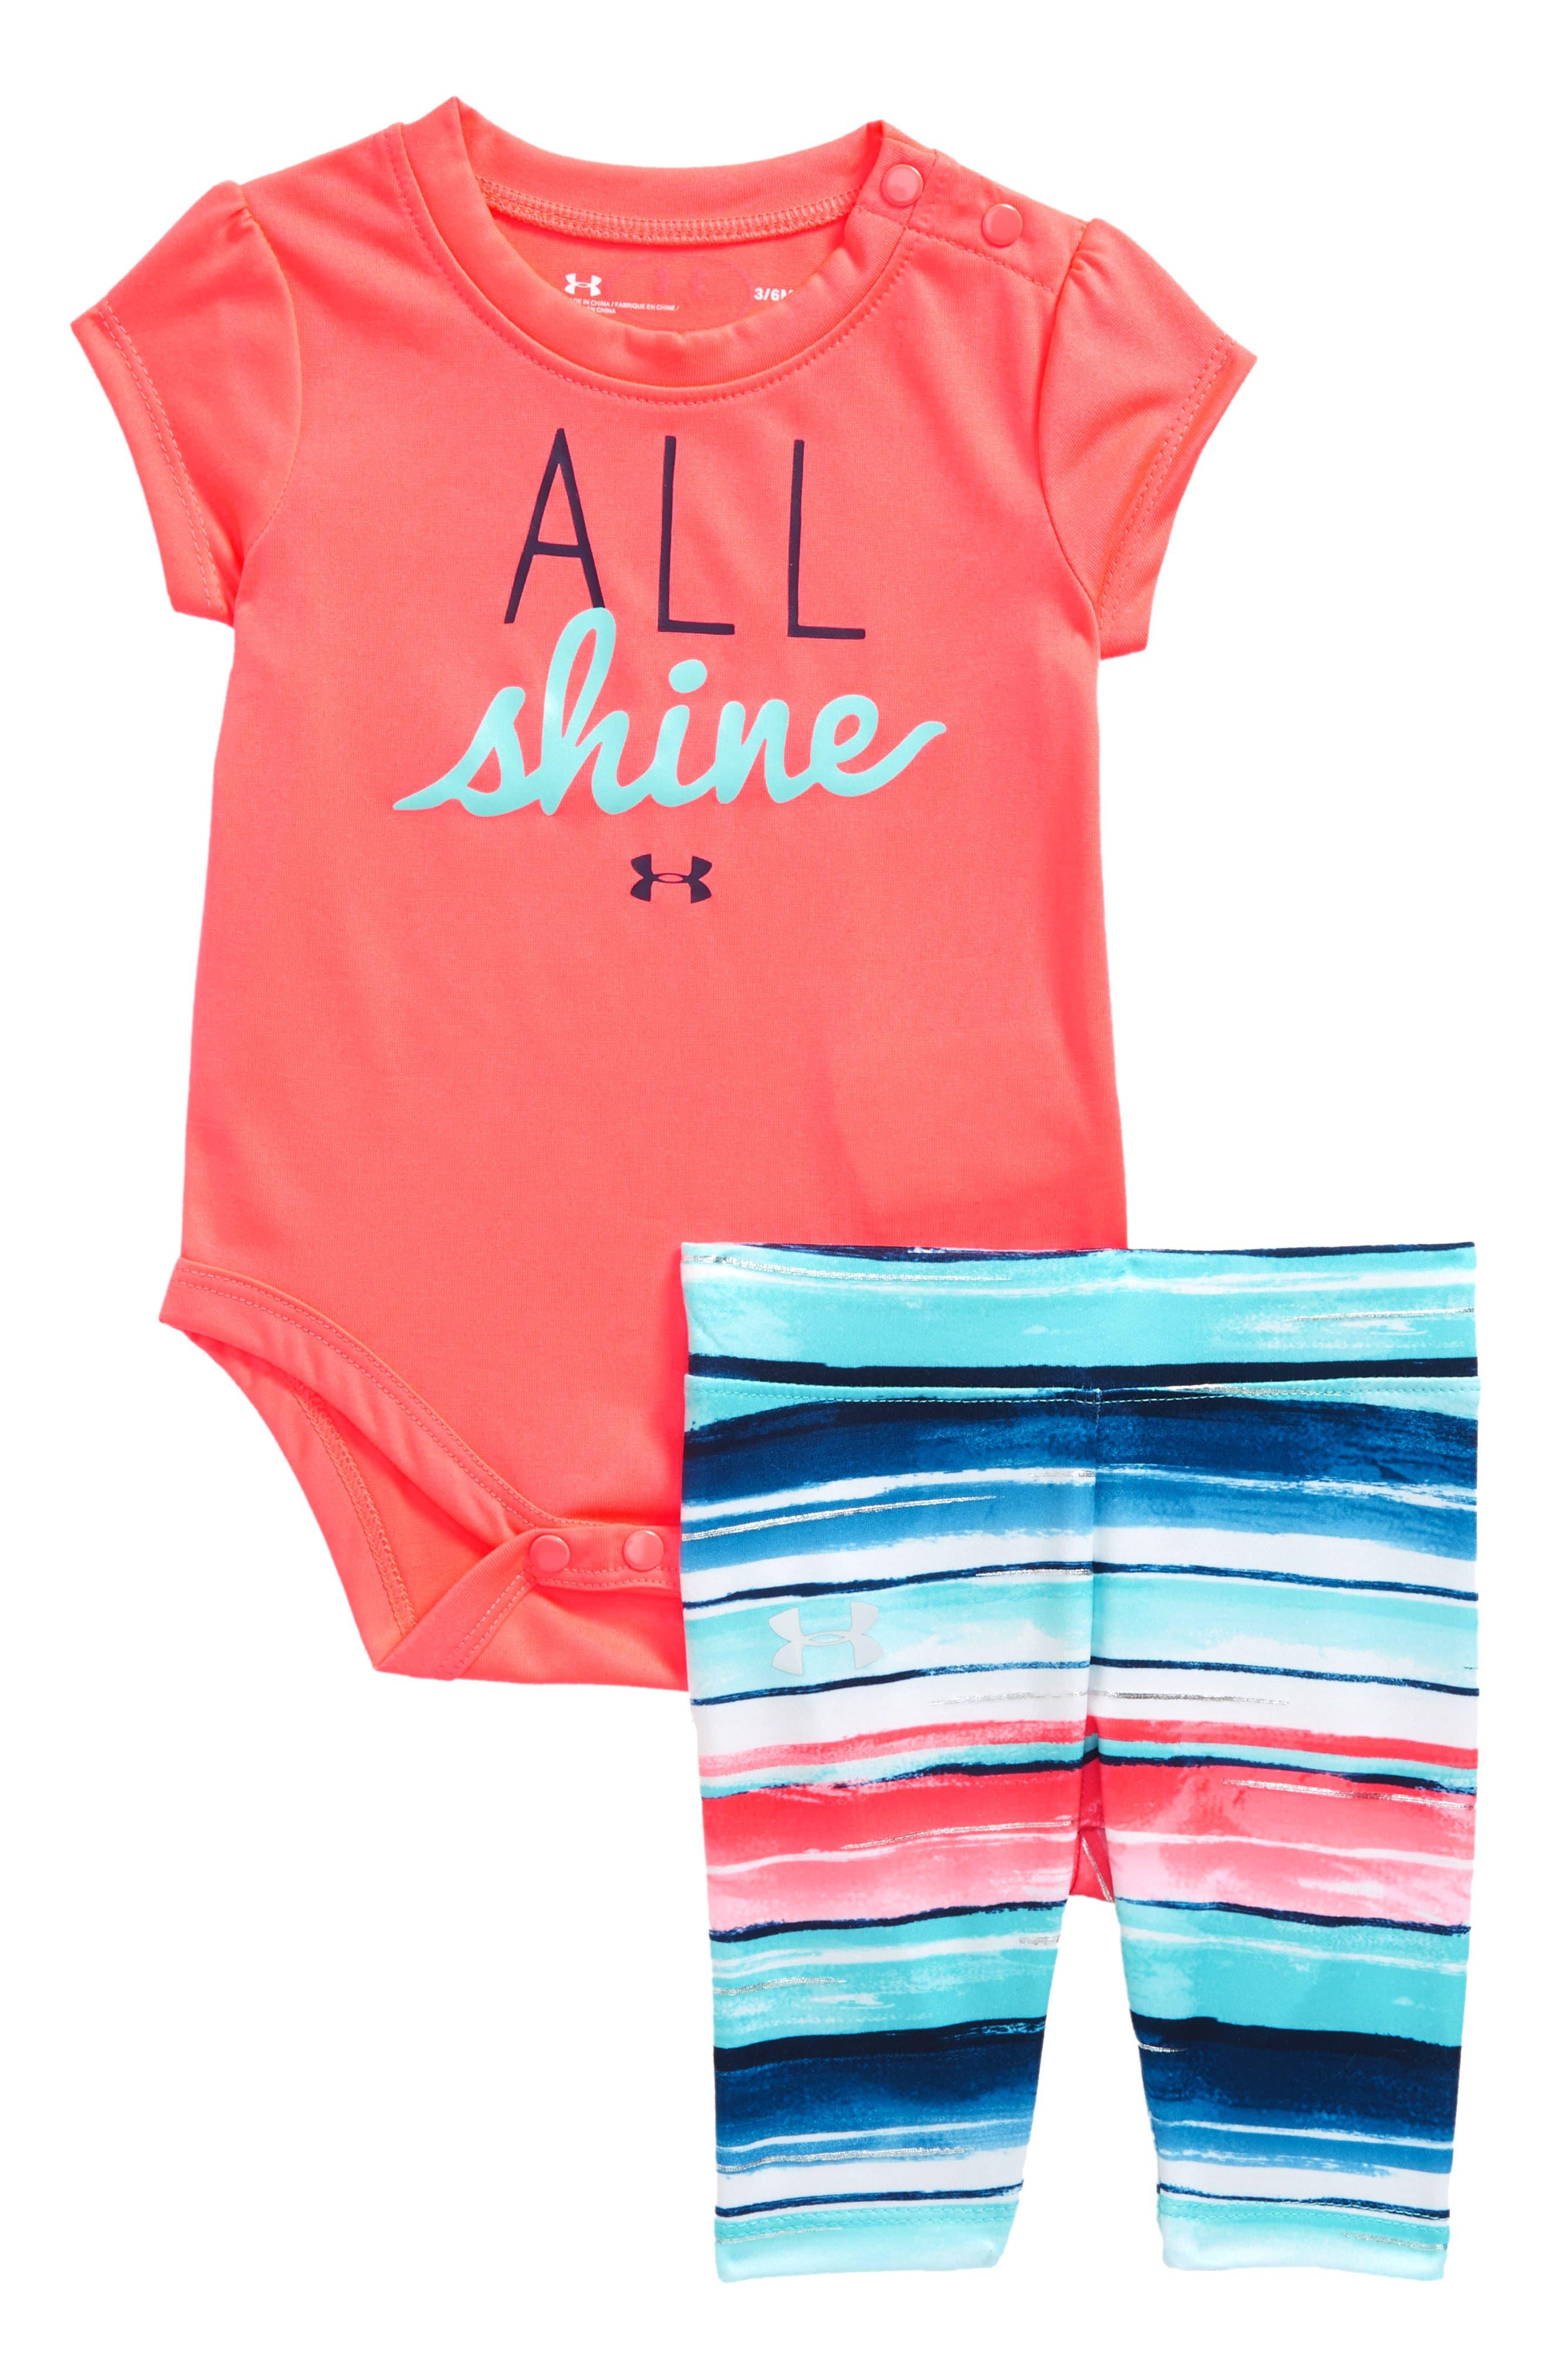 Main Image - Under Armour All Shine Bodysuit & Leggings Set (Baby Girls)